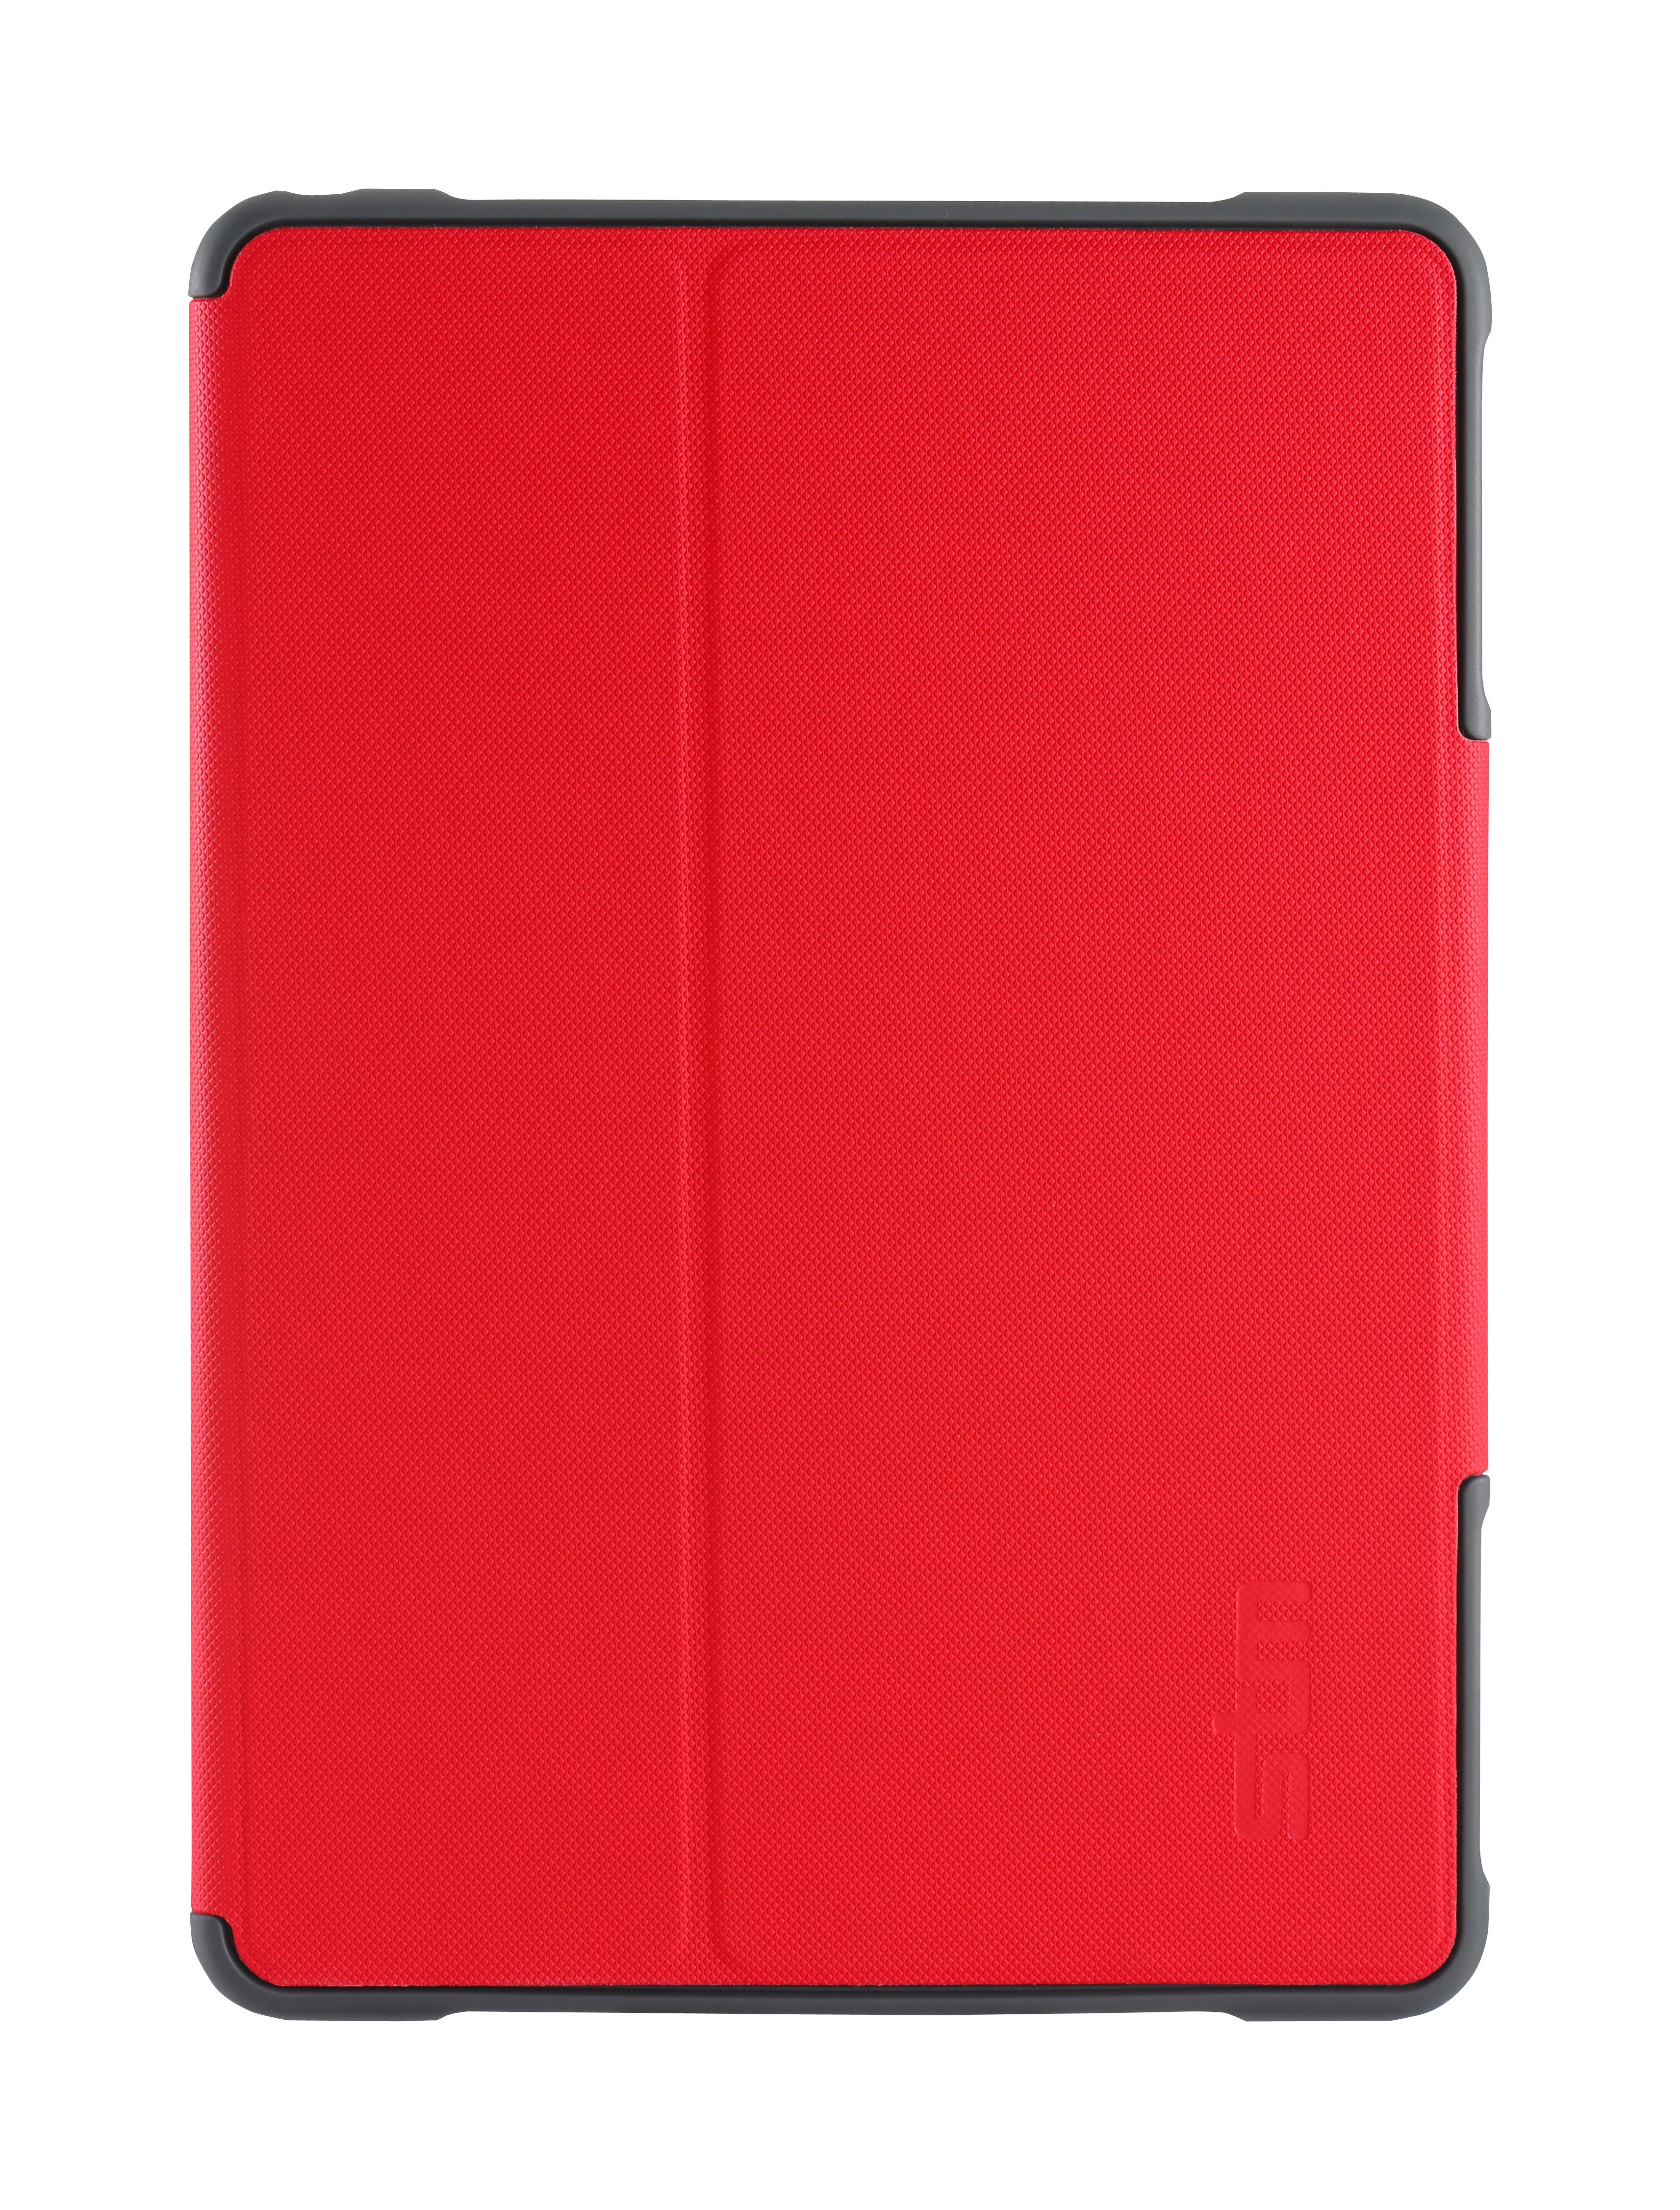 STM Dux Rugged Case for iPad Air 2